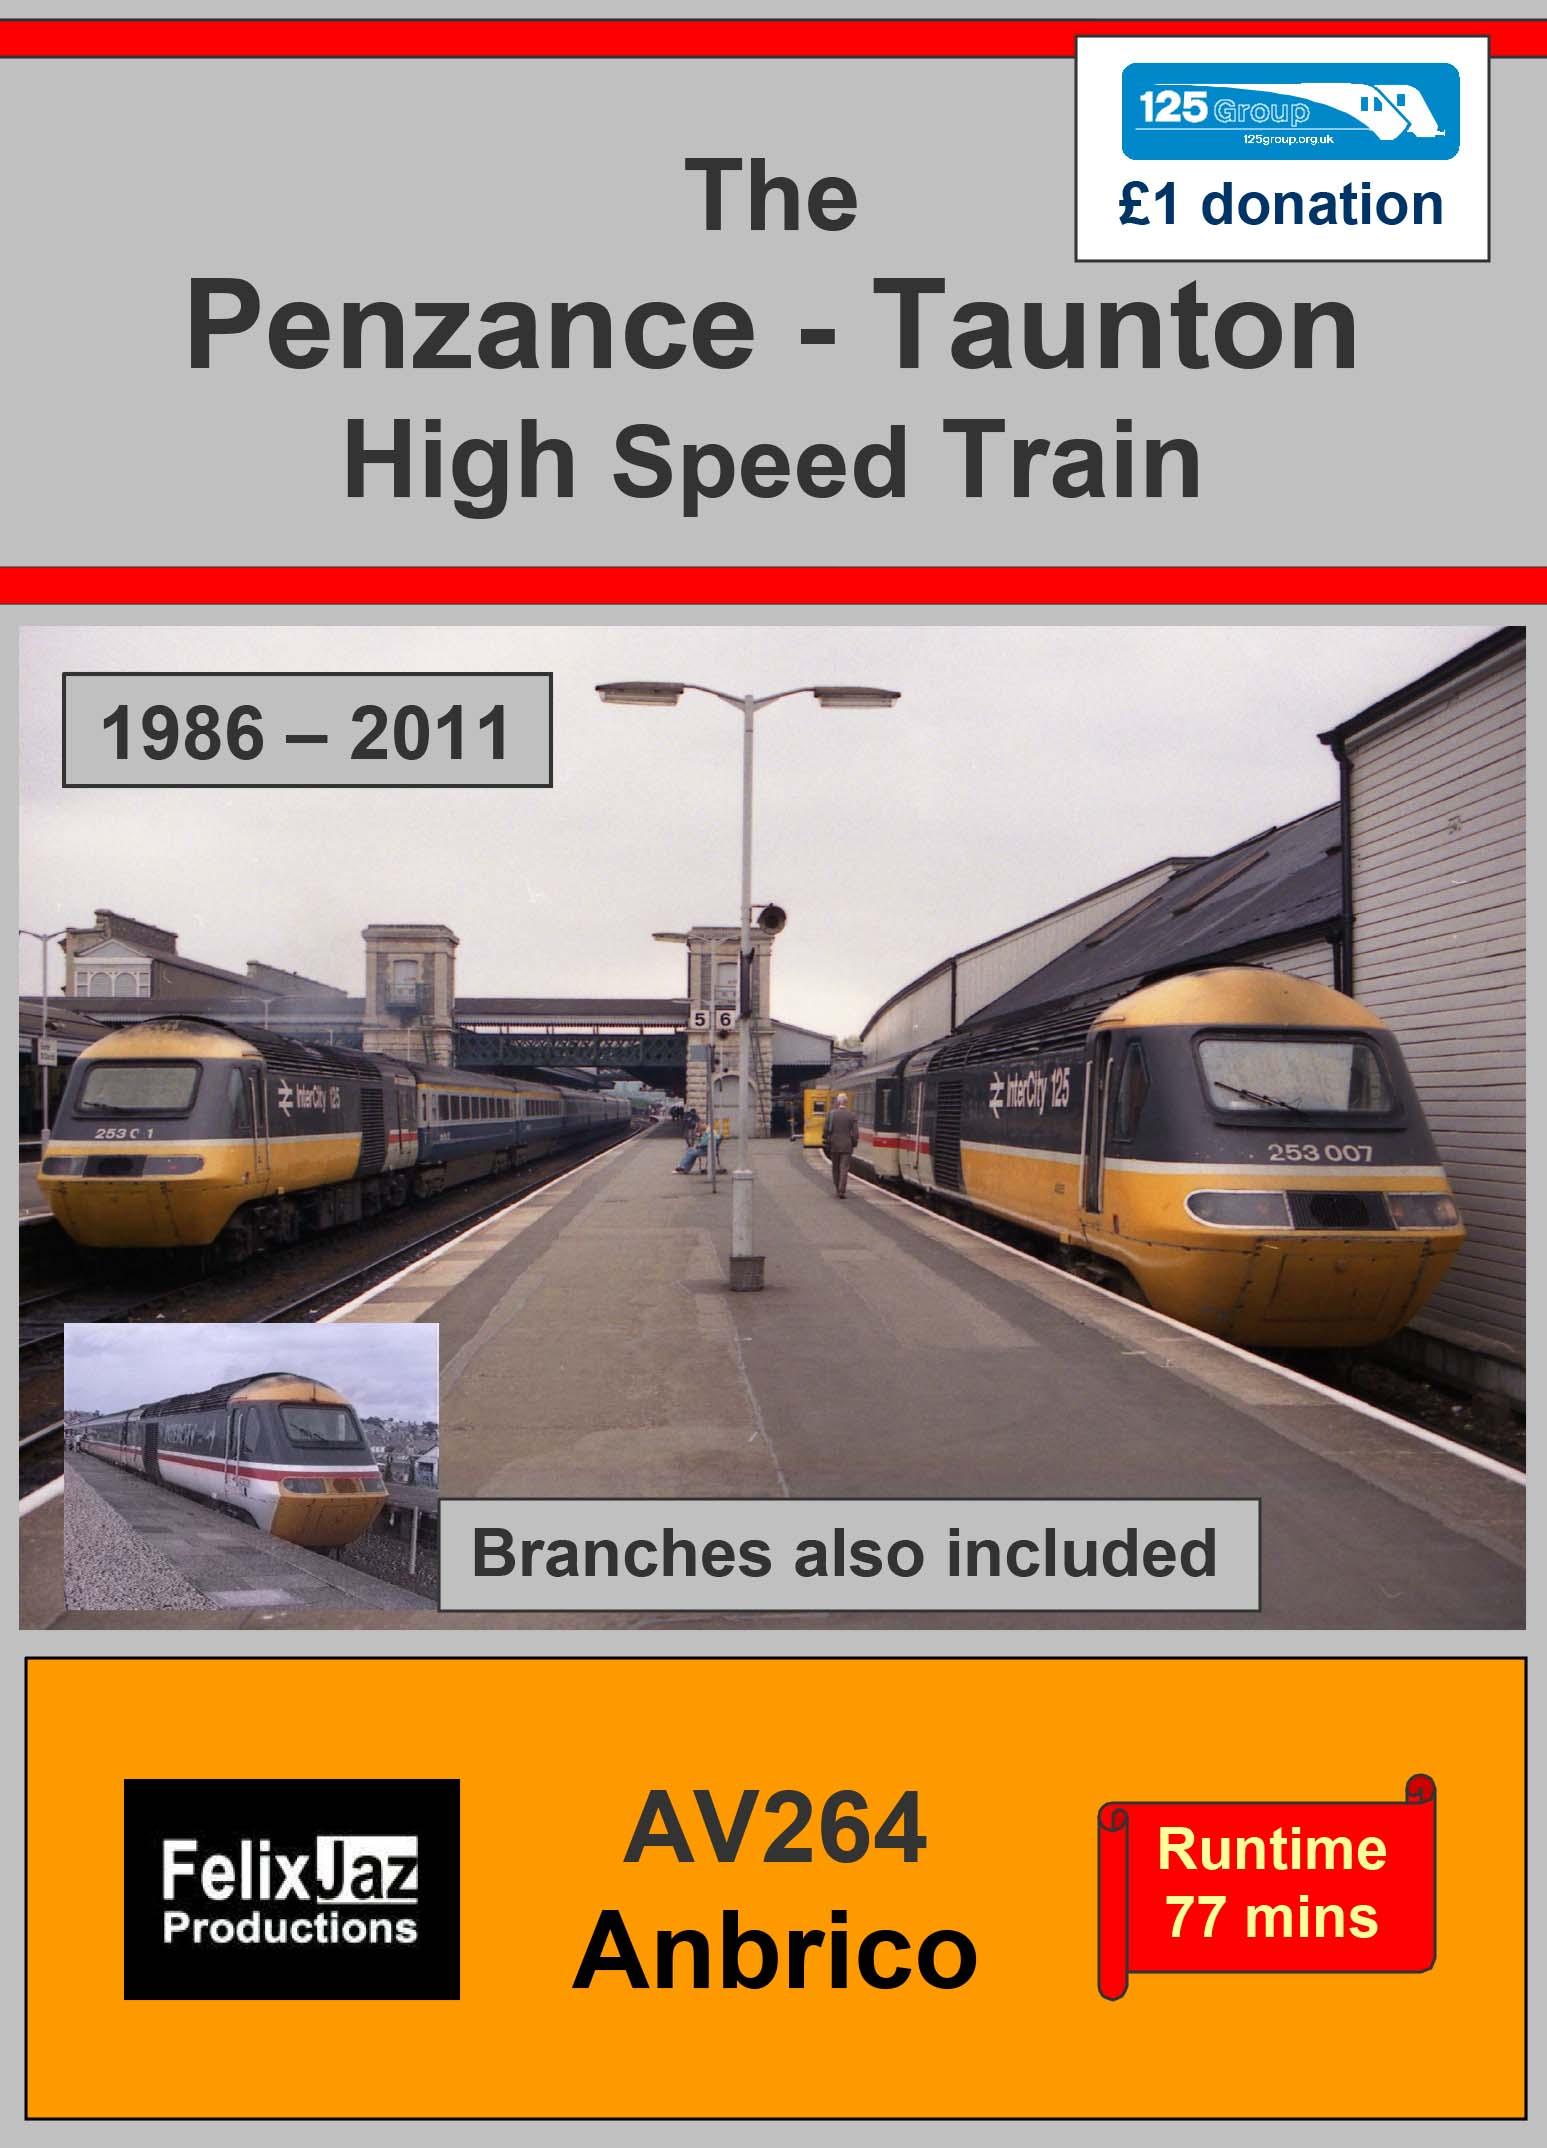 AV264 The Penzance to Taunton High Speed Train